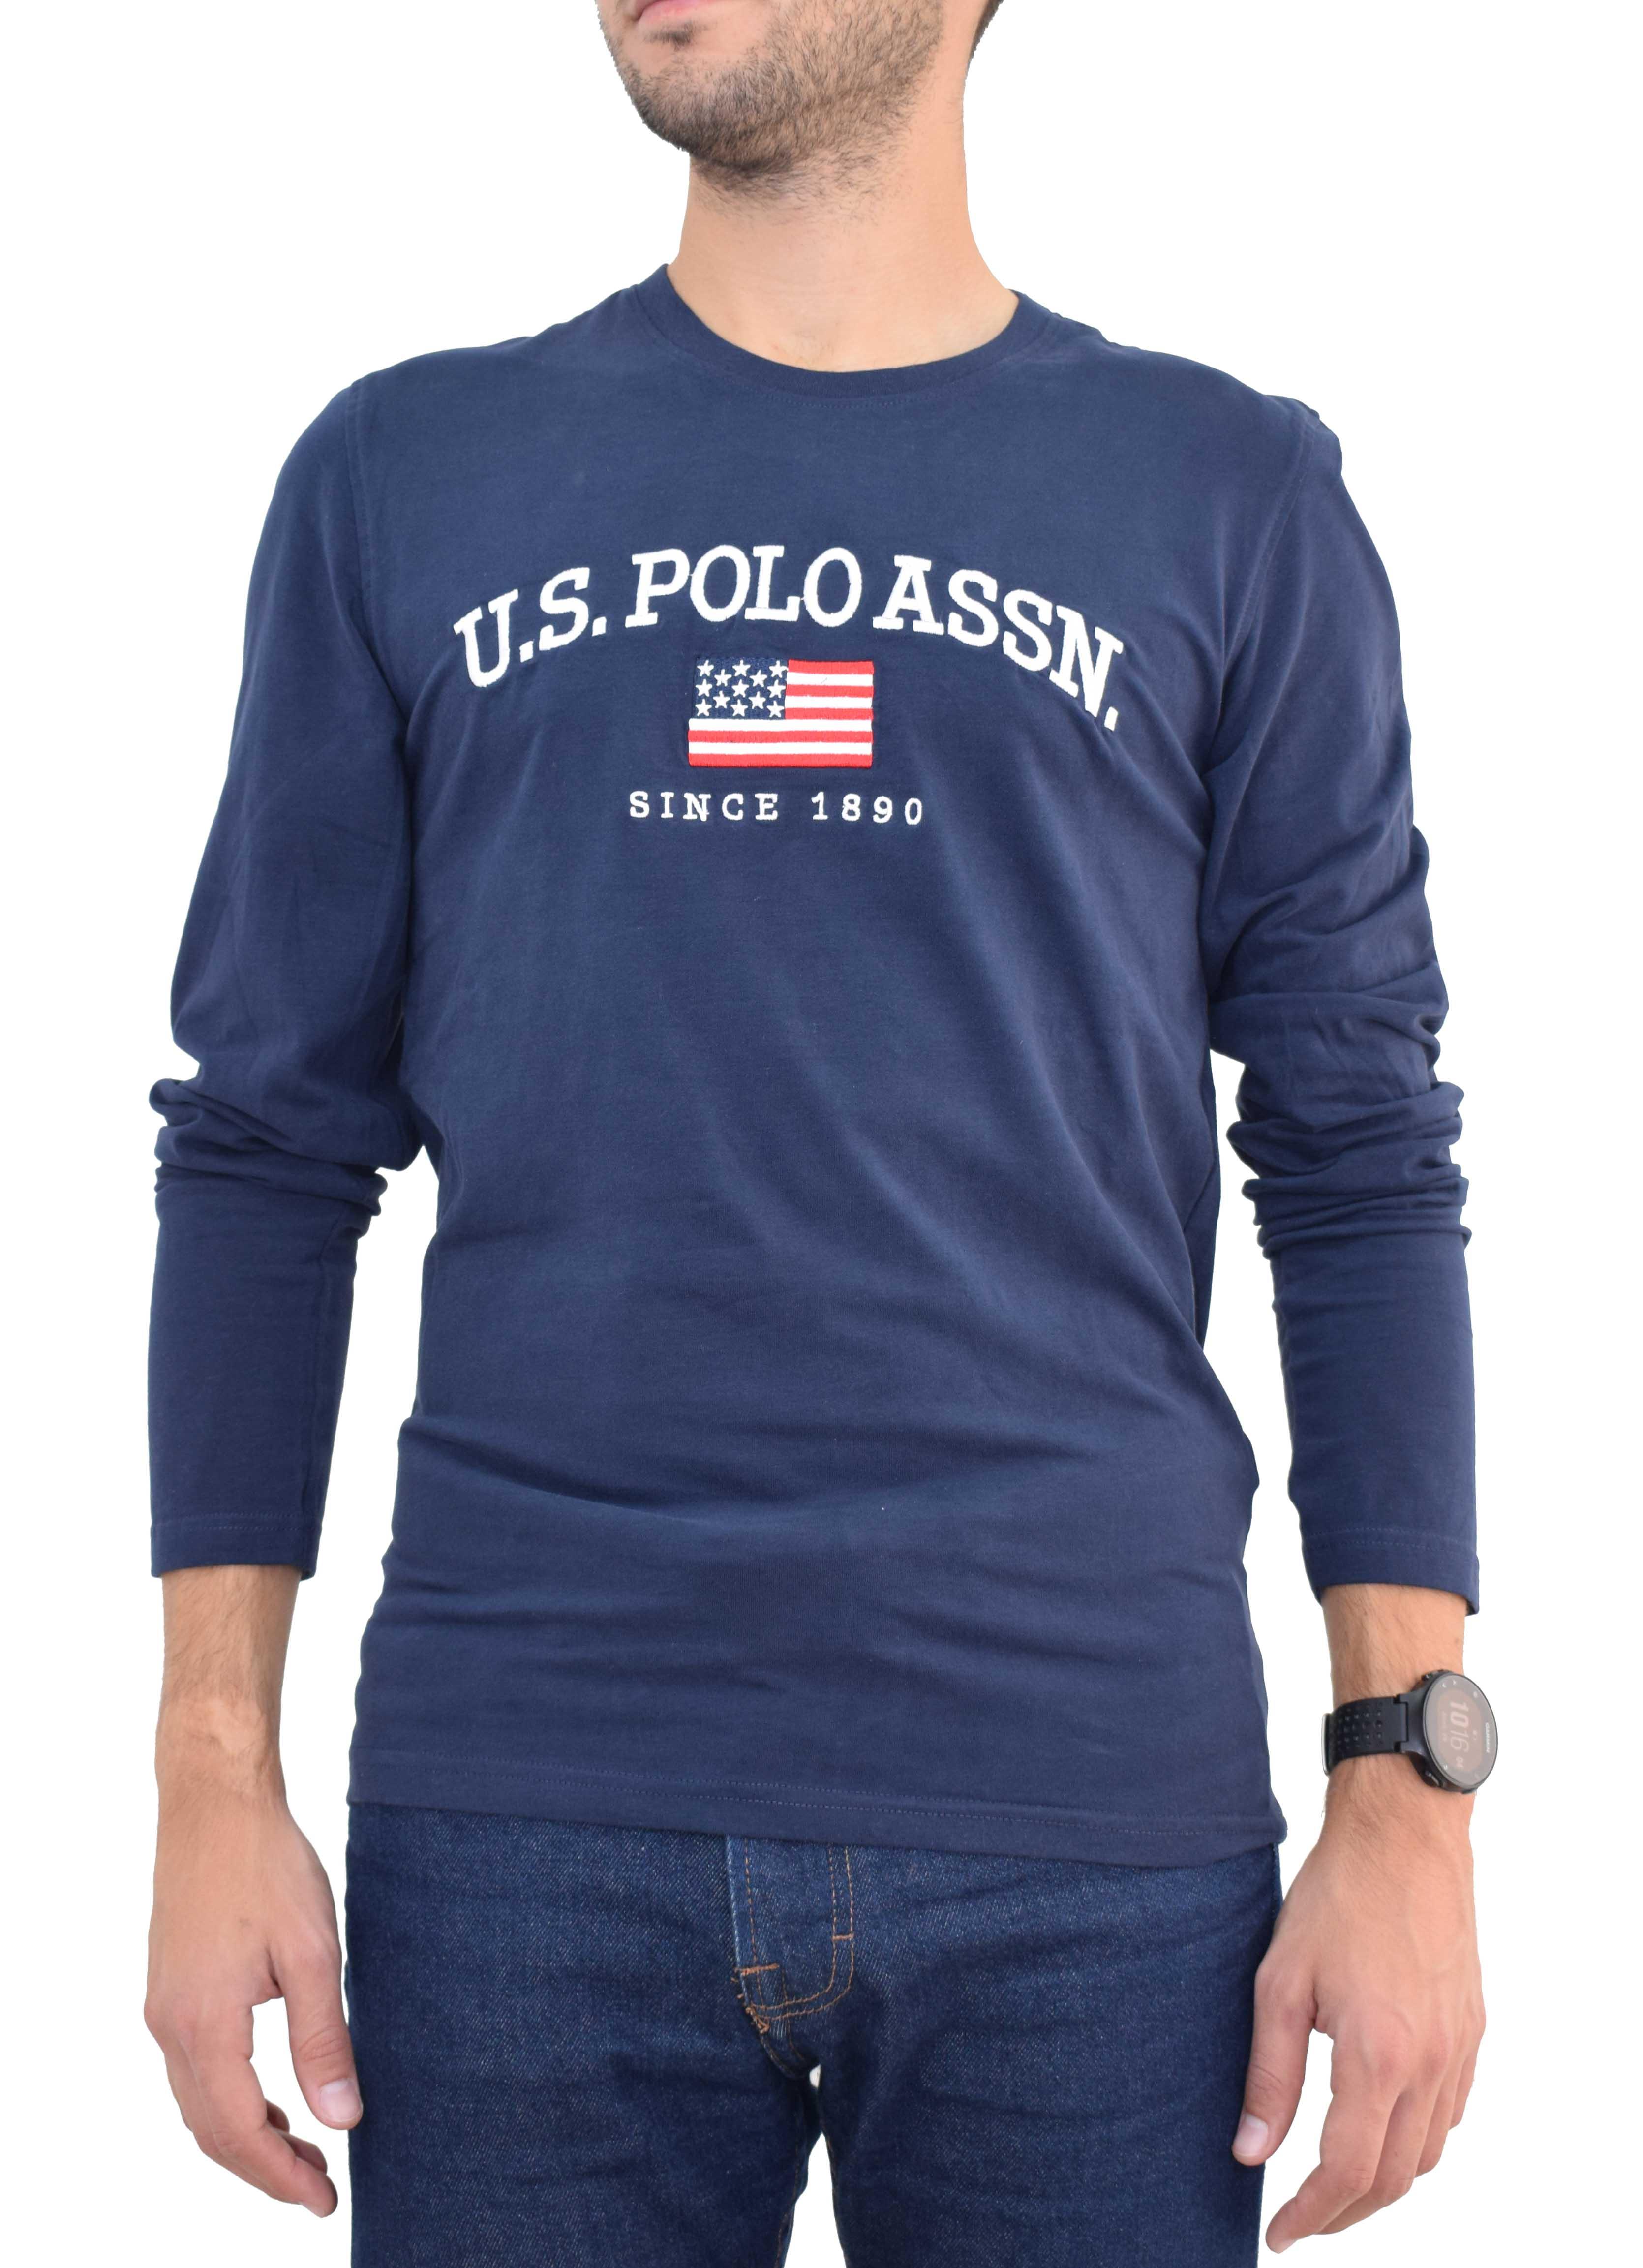 fb8f1735acca T-shirt l-s Logo U.S. Polo Assn. 50810-48769 - μπλε - Glami.gr